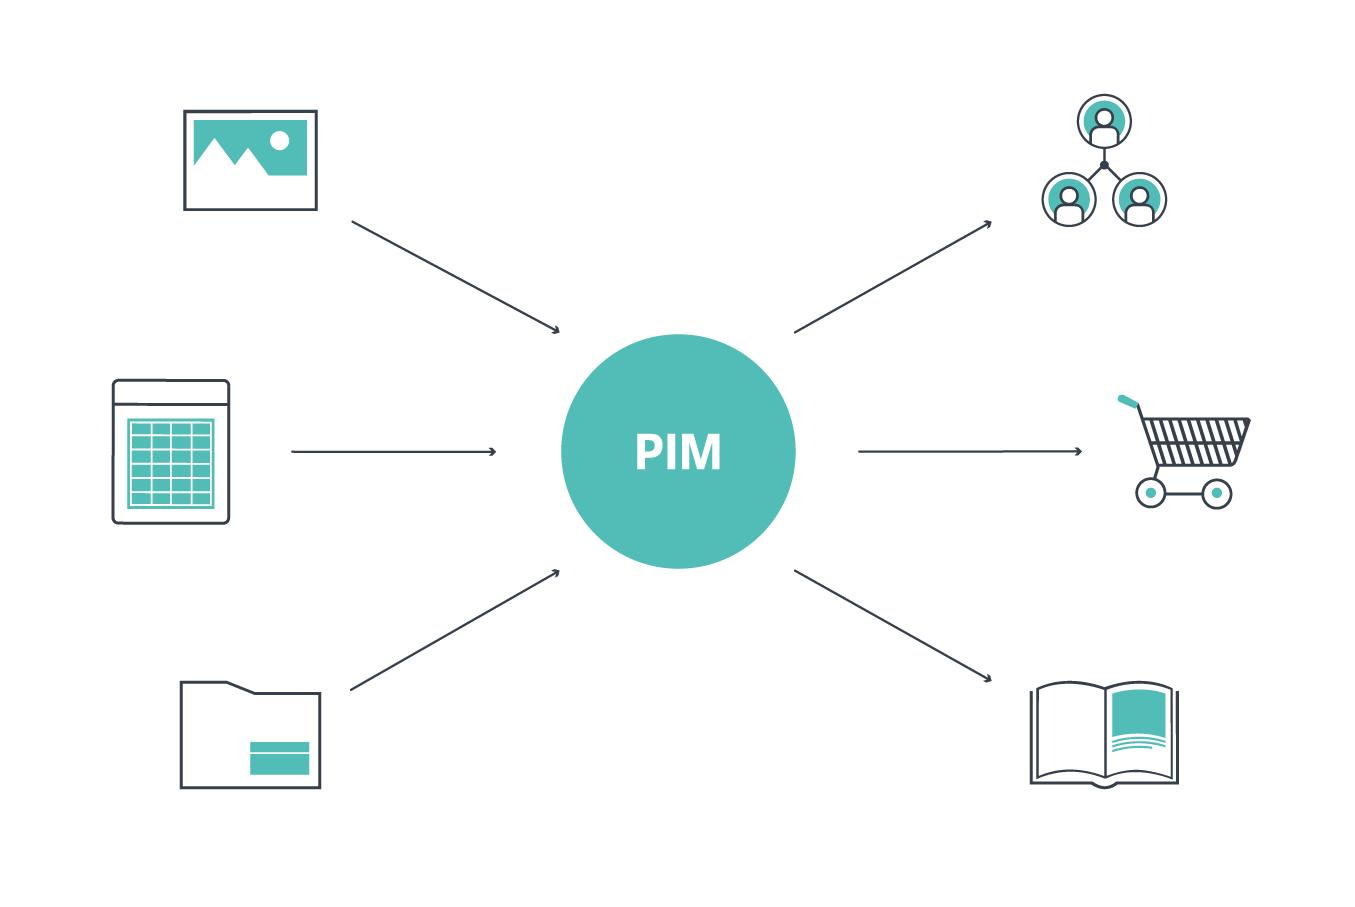 diagram-what-s-pim-V.png